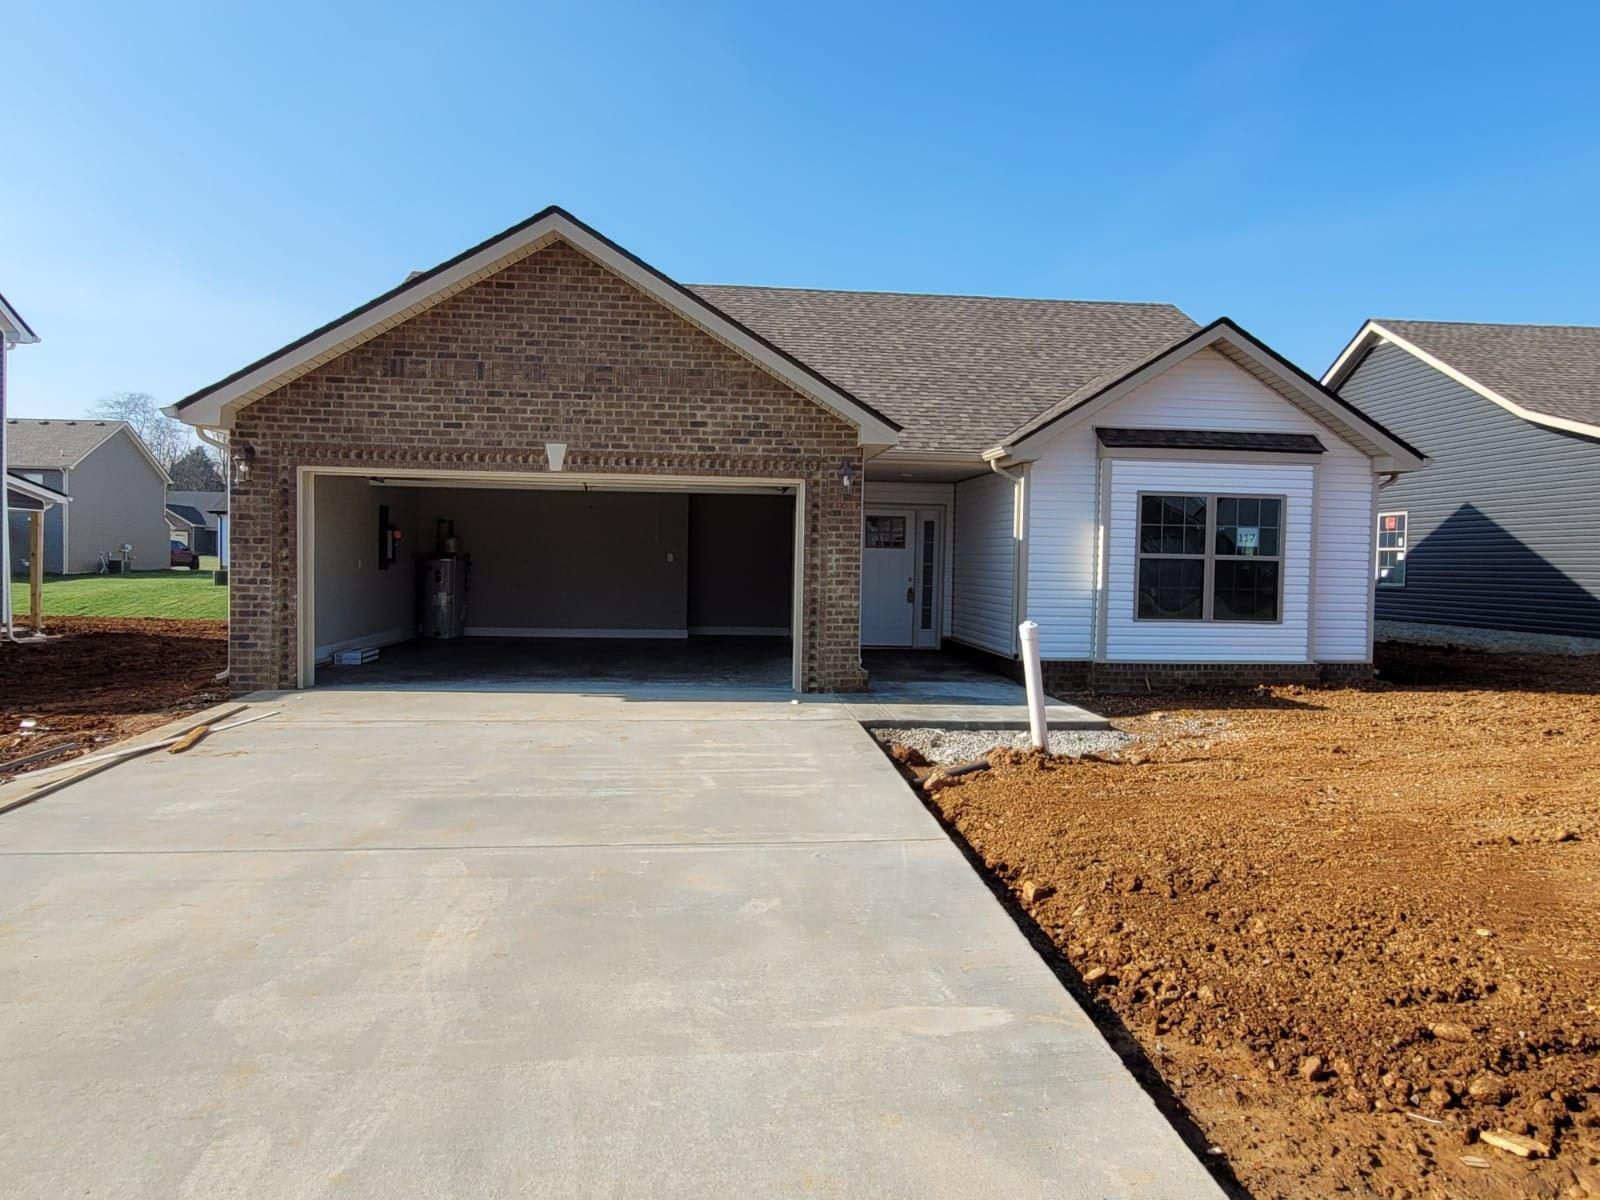 117 Irish Hills, Clarksville, TN 37042 - MLS#: 2298694